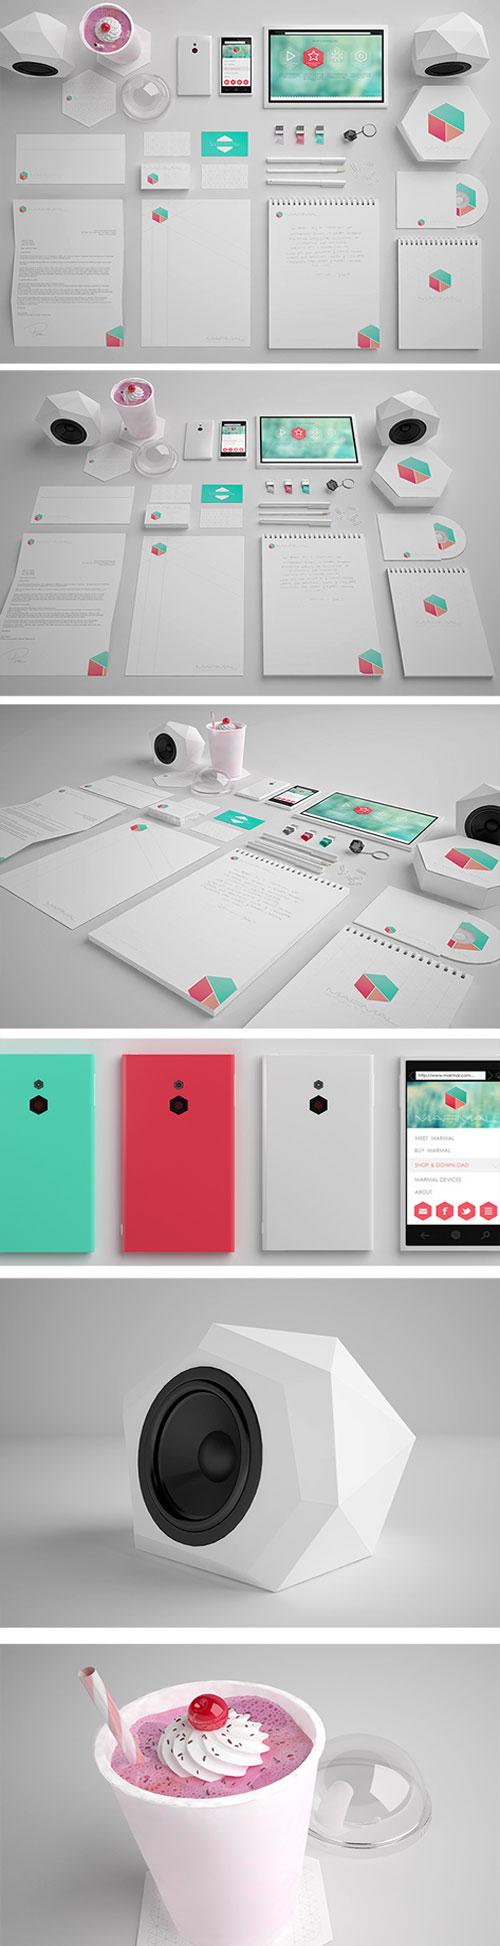 corporate-identity-design-3